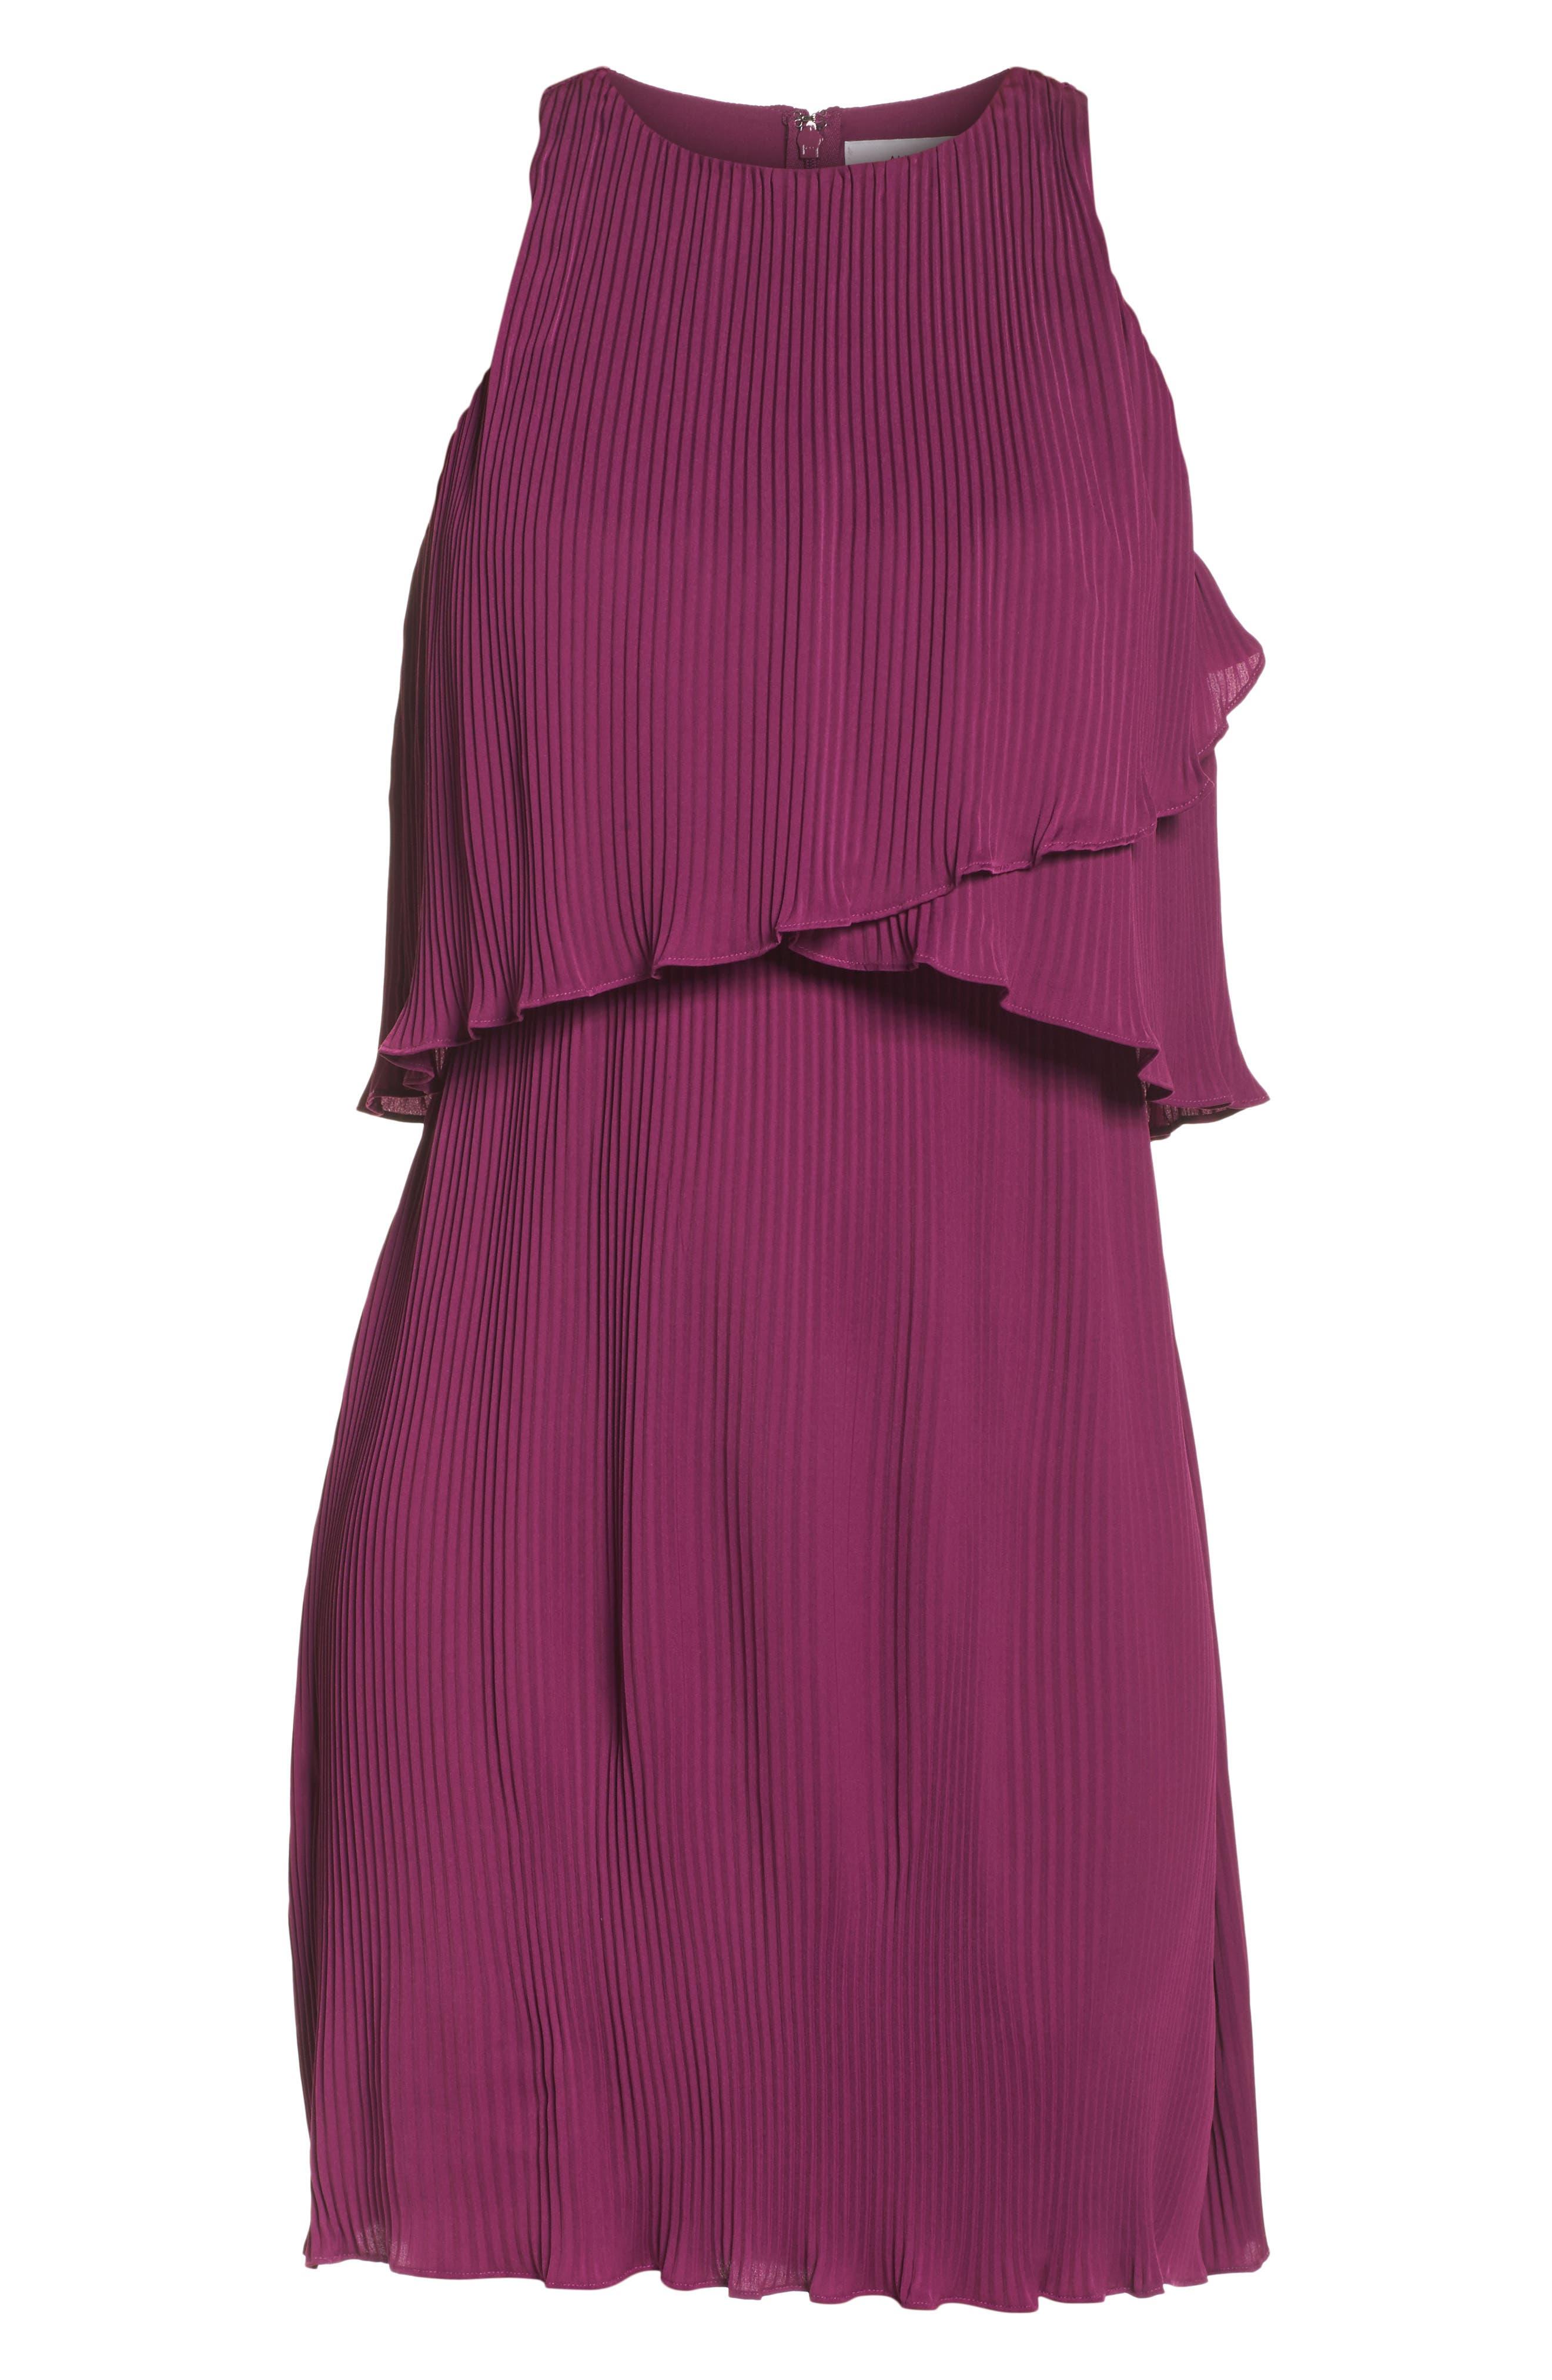 Mademoiselle Ruffle Swing Dress,                             Alternate thumbnail 6, color,